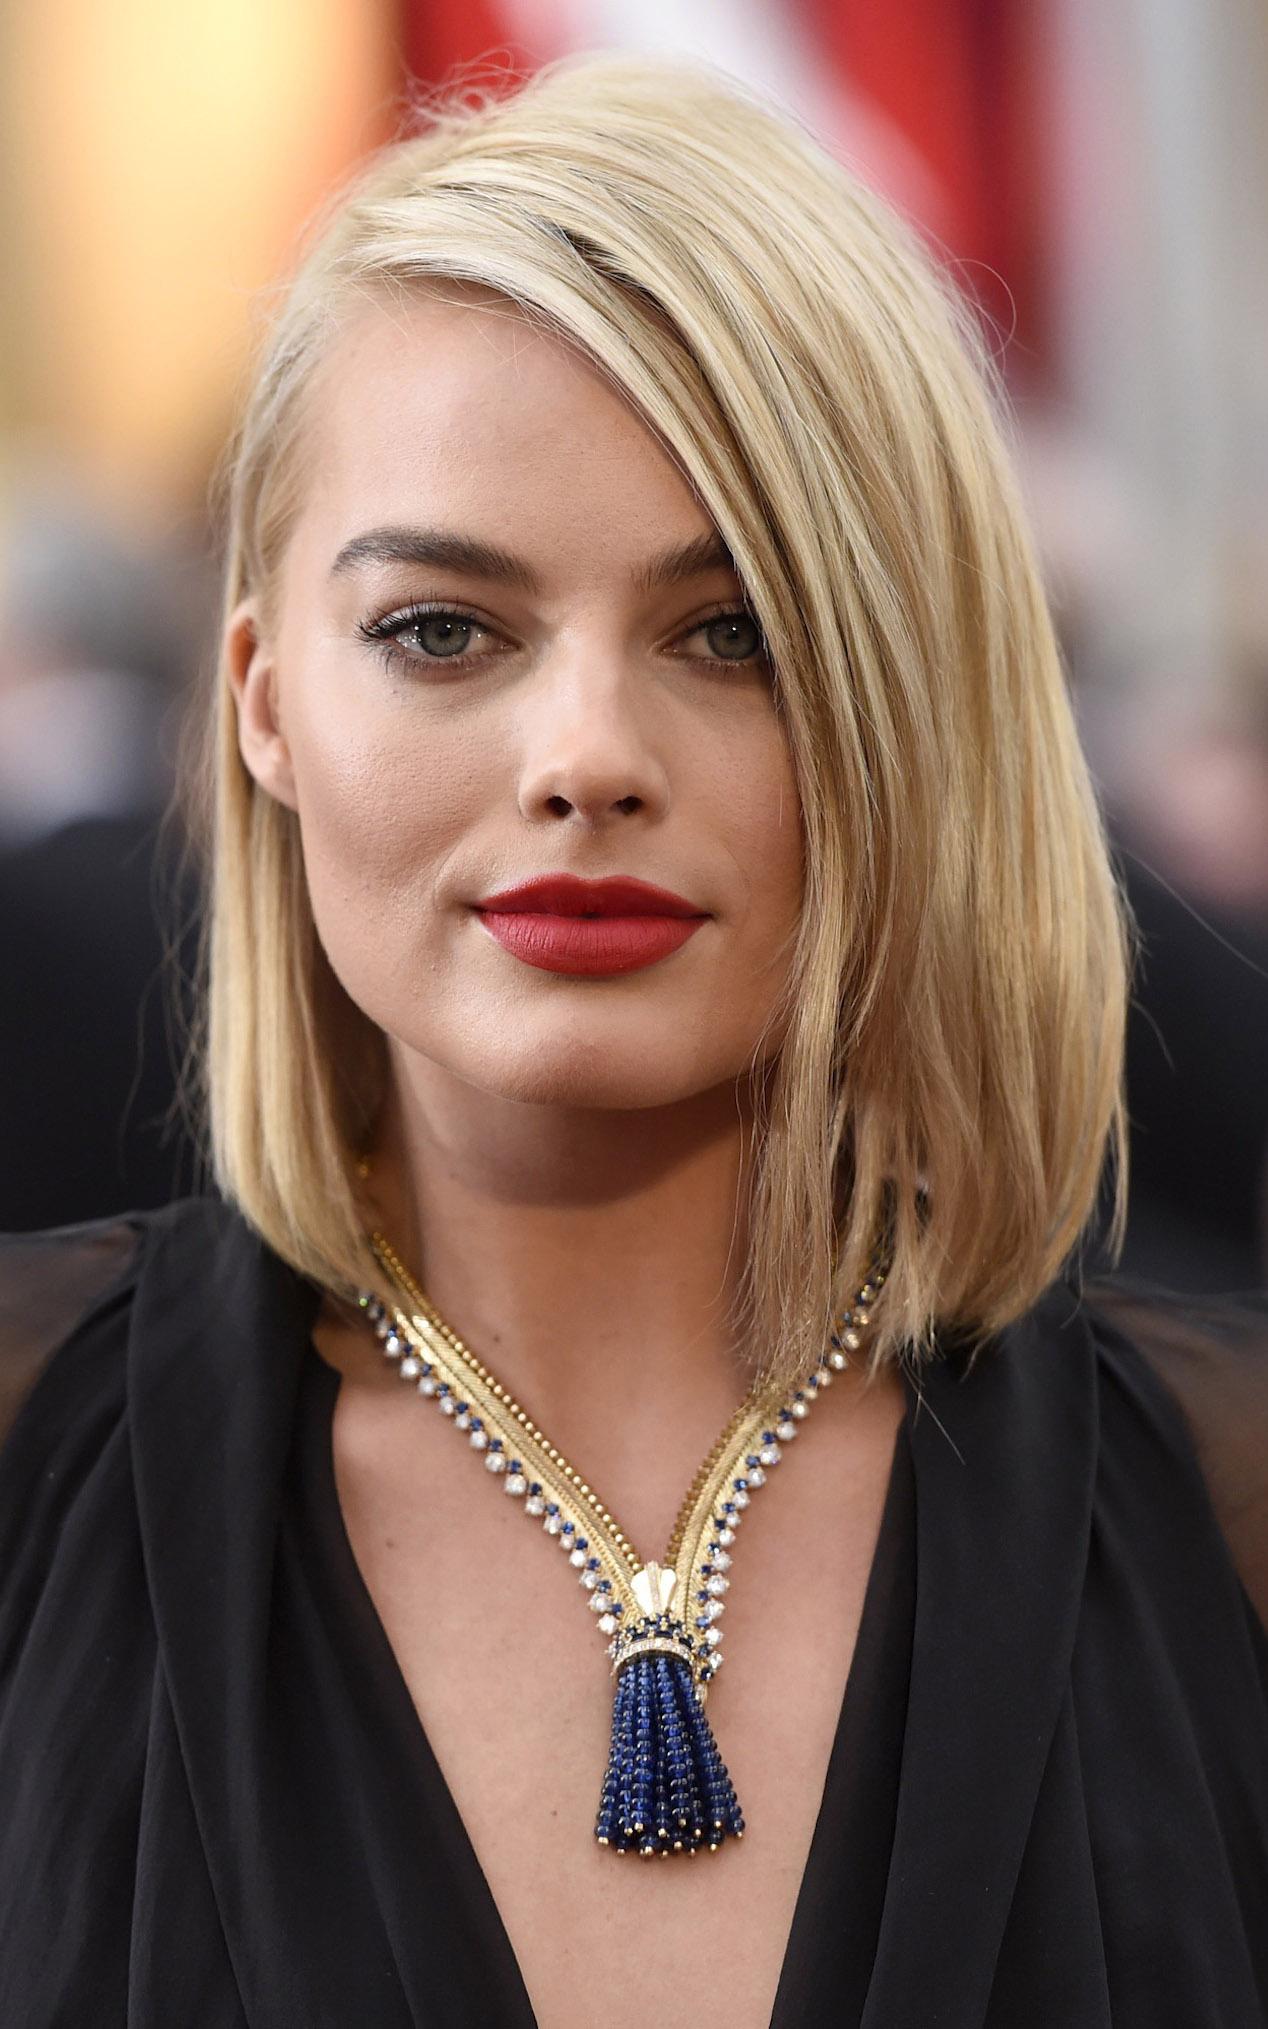 what-to-wear-square-face-shape-style-haircut-sunglasses-hat-earrings-jewelry-margotrobbie-oscars-lob-blonde.jpg